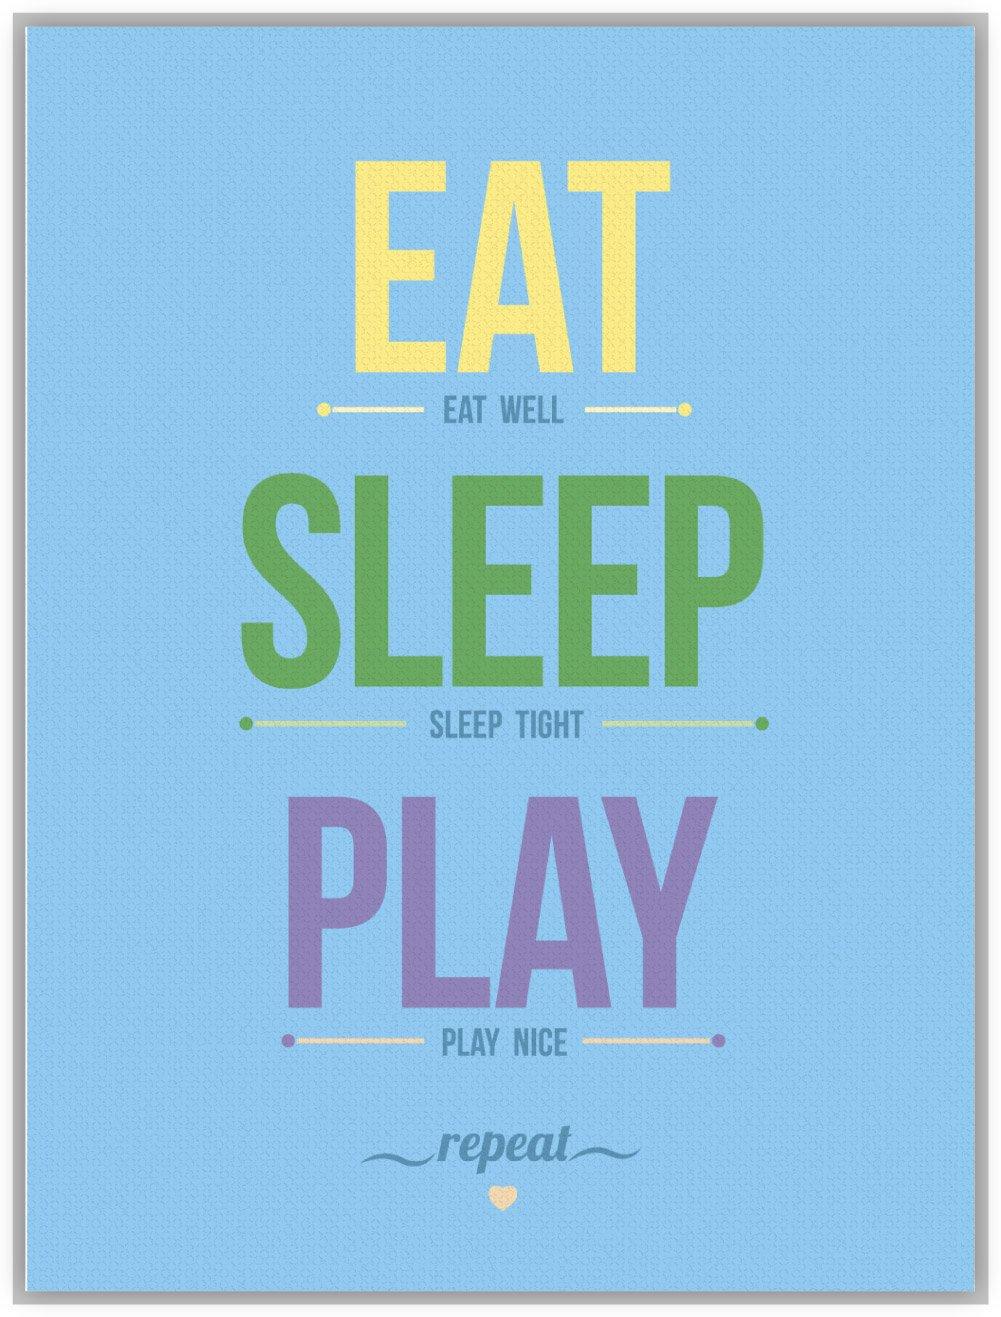 art 轻艺术 图说语录 吃睡玩 b款蓝色 北欧英文字母图片儿童房海报图片